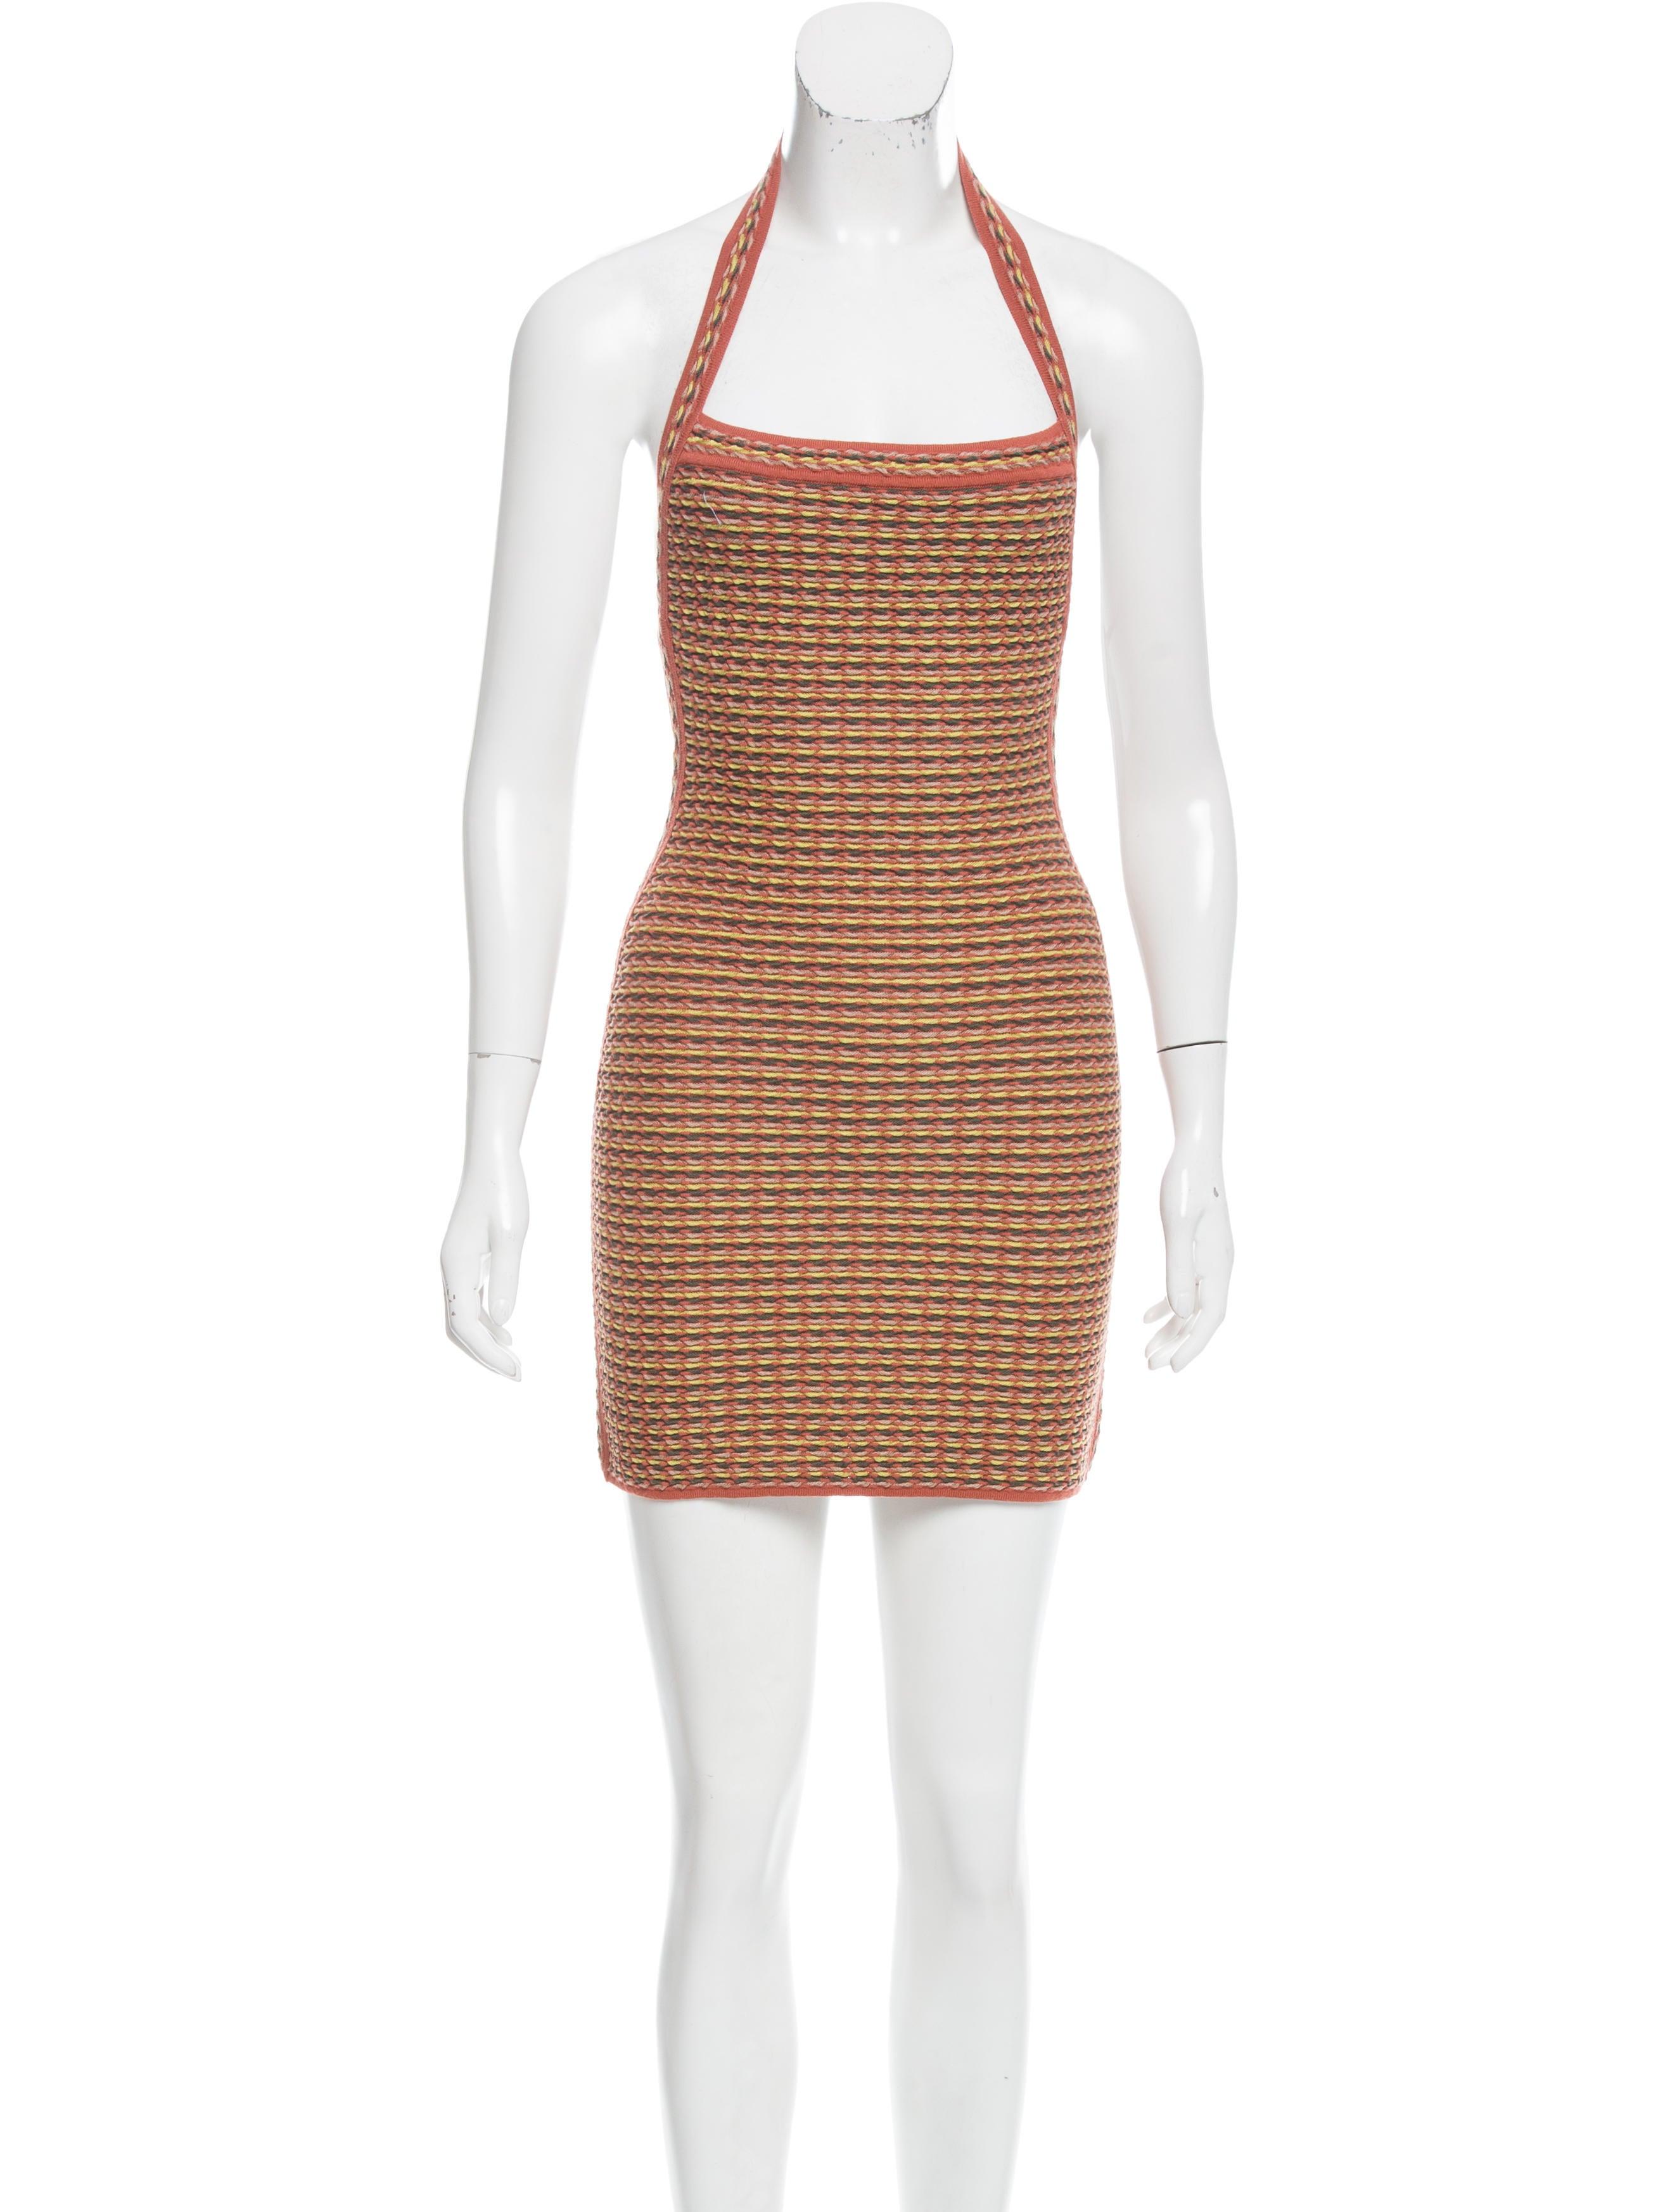 m missoni patterned mini dress clothing wm442318 the realreal. Black Bedroom Furniture Sets. Home Design Ideas